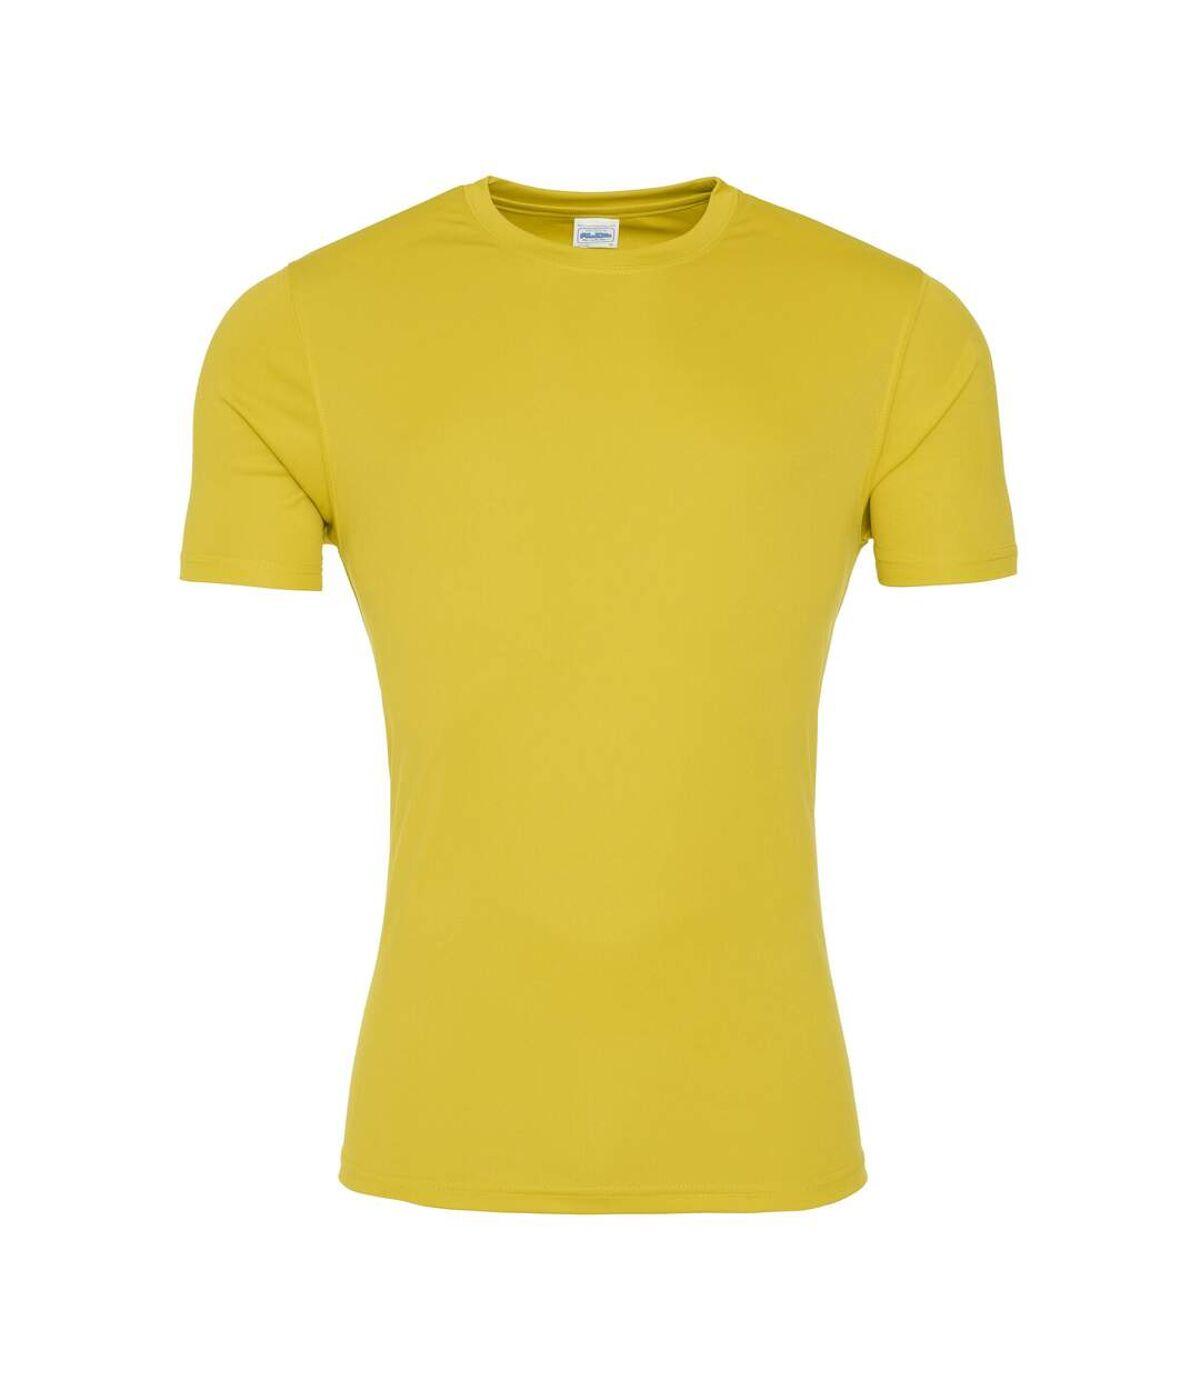 AWDis Just Cool - T-shirt sport - Homme (Jaune soleil) - UTRW5357